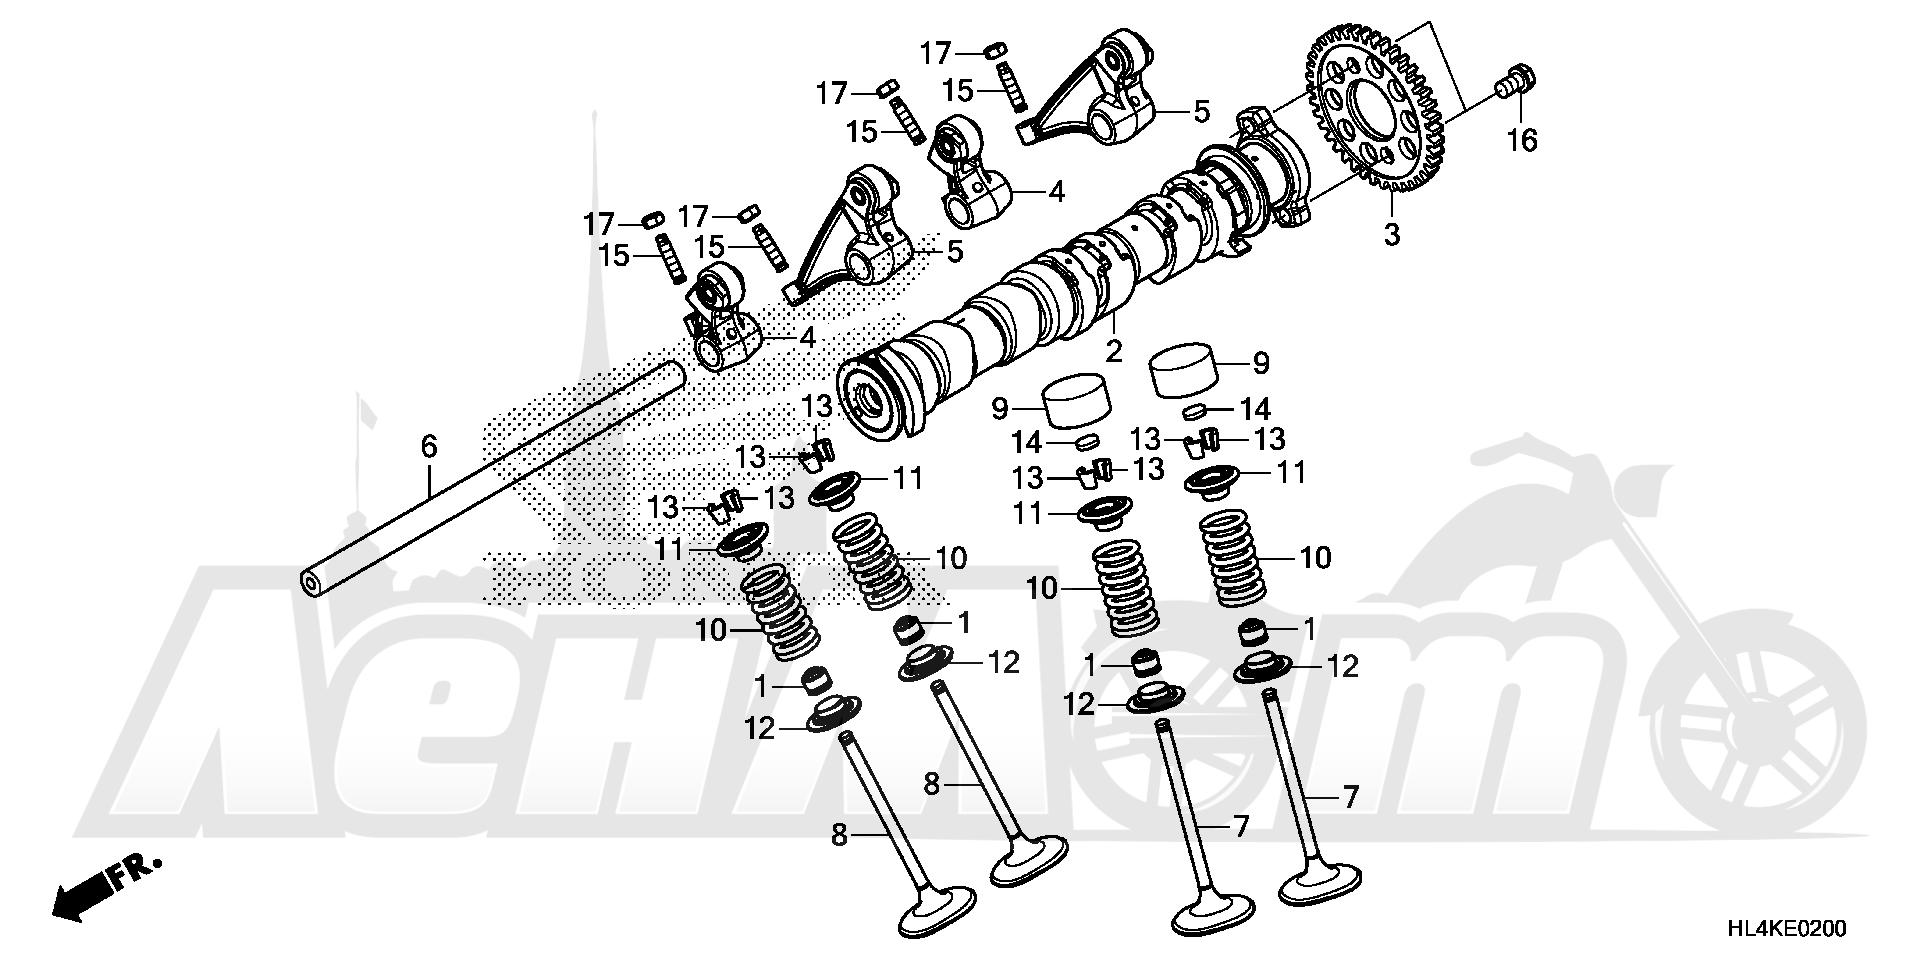 Запчасти для Квадроцикла Honda 2019 SXS1000M3P Раздел: CAMSHAFT AND VALVE | распредвал и клапан